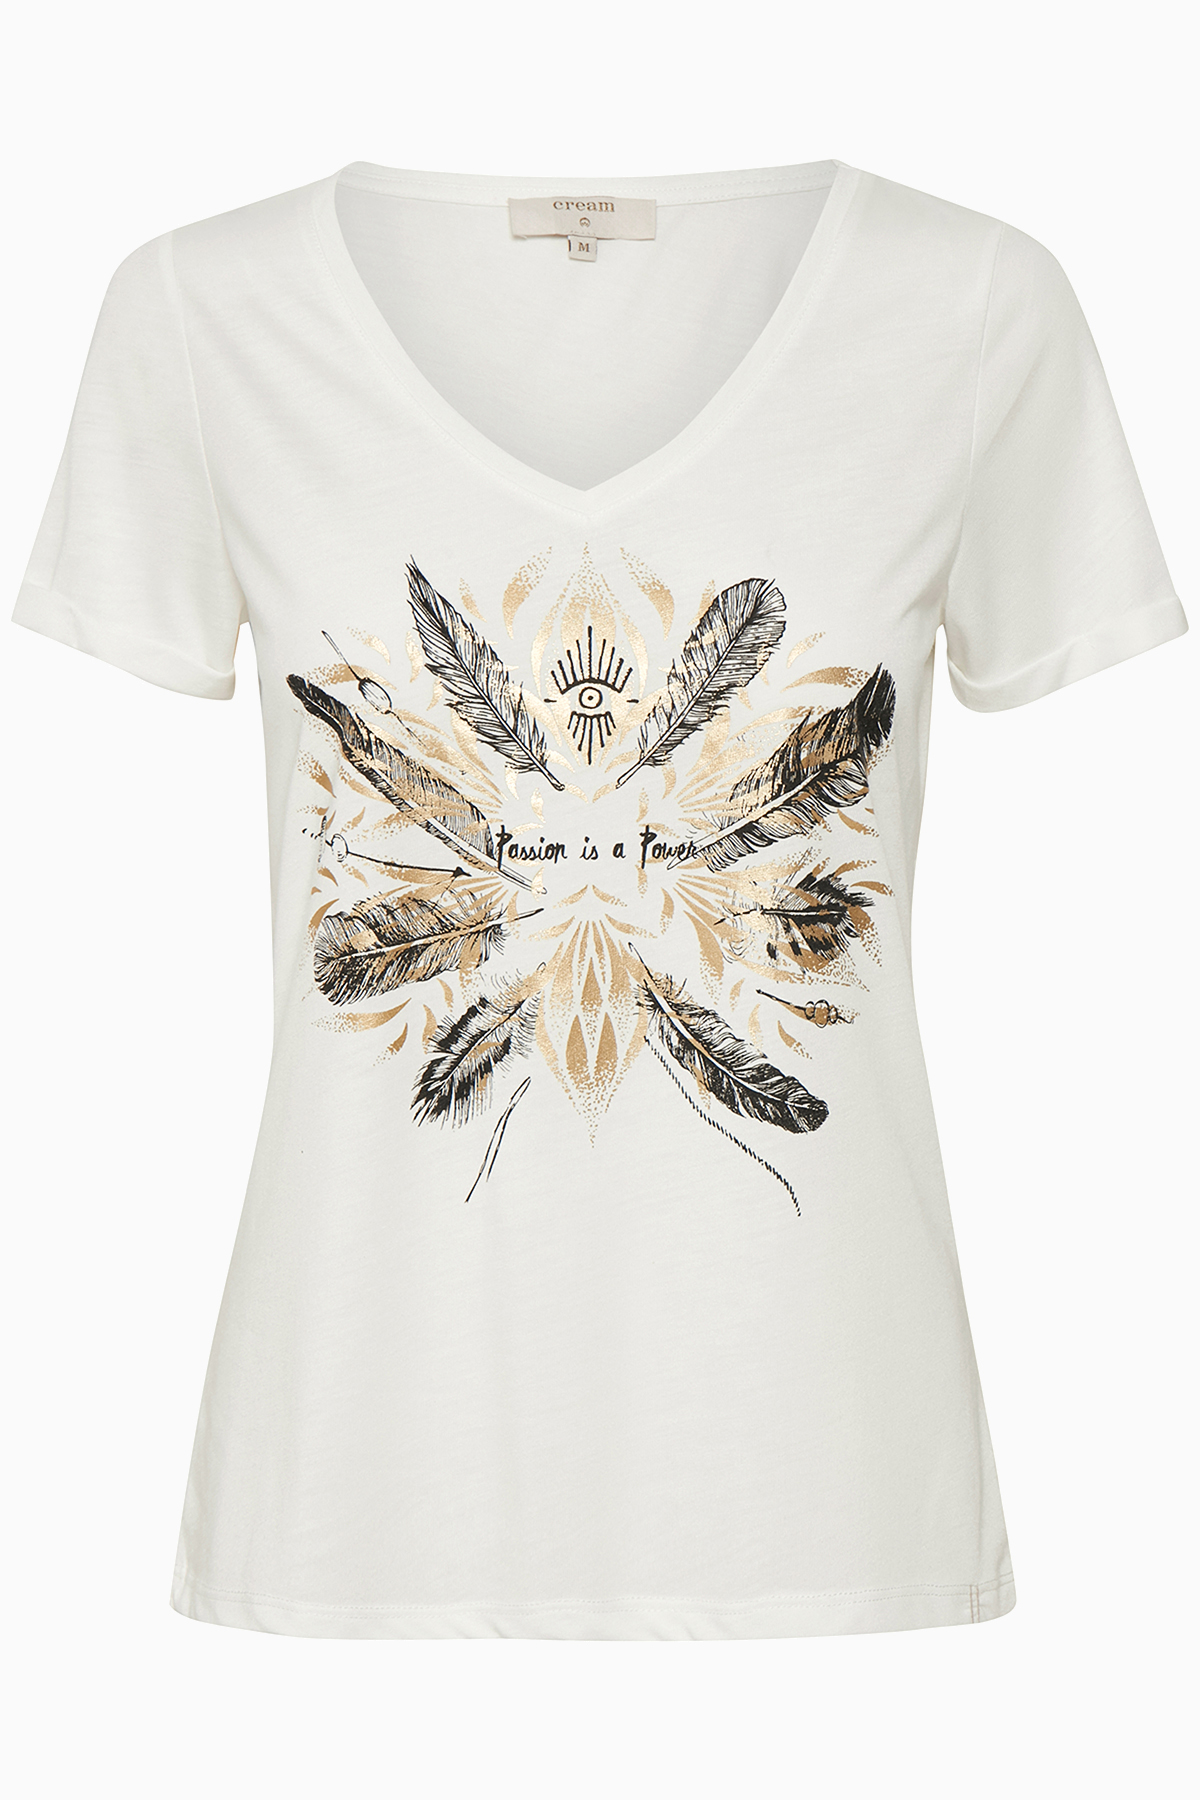 Image of Cream Dame Enkel Heather T-shirt - Off-white